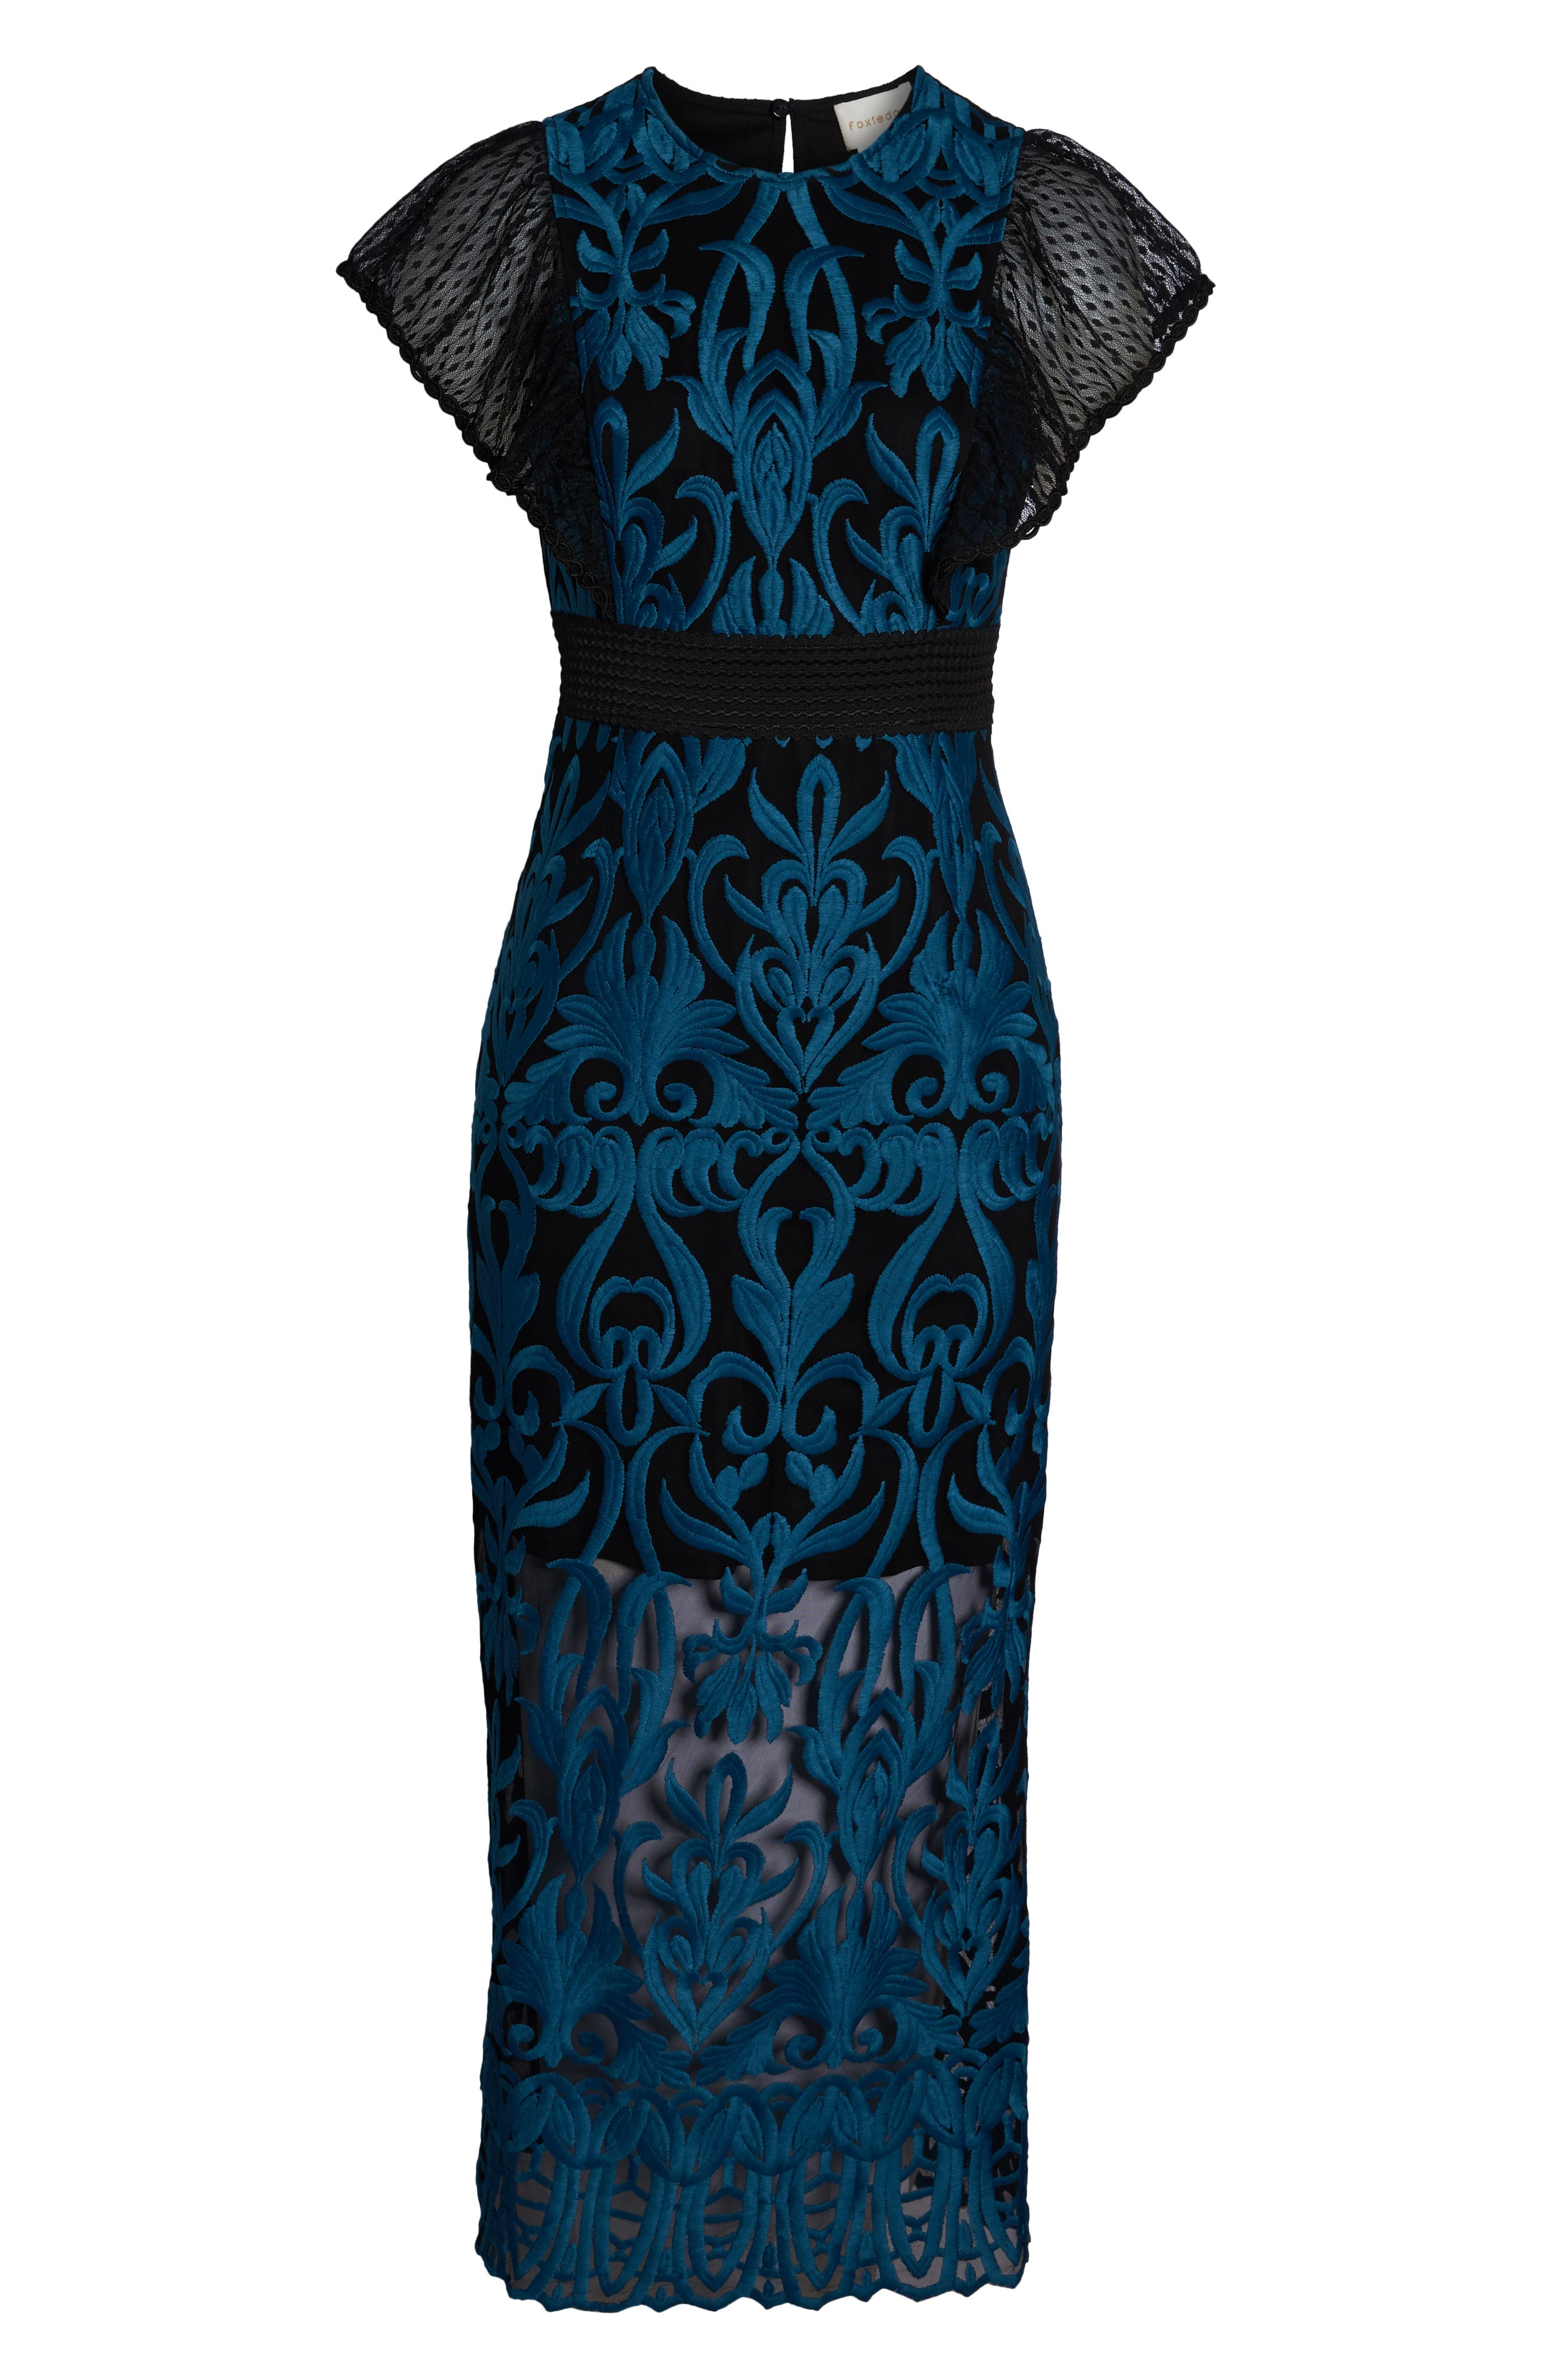 FOXIEDOX, Rosalynn Lace Midi Dress, Alternate thumbnail 7, color, 440